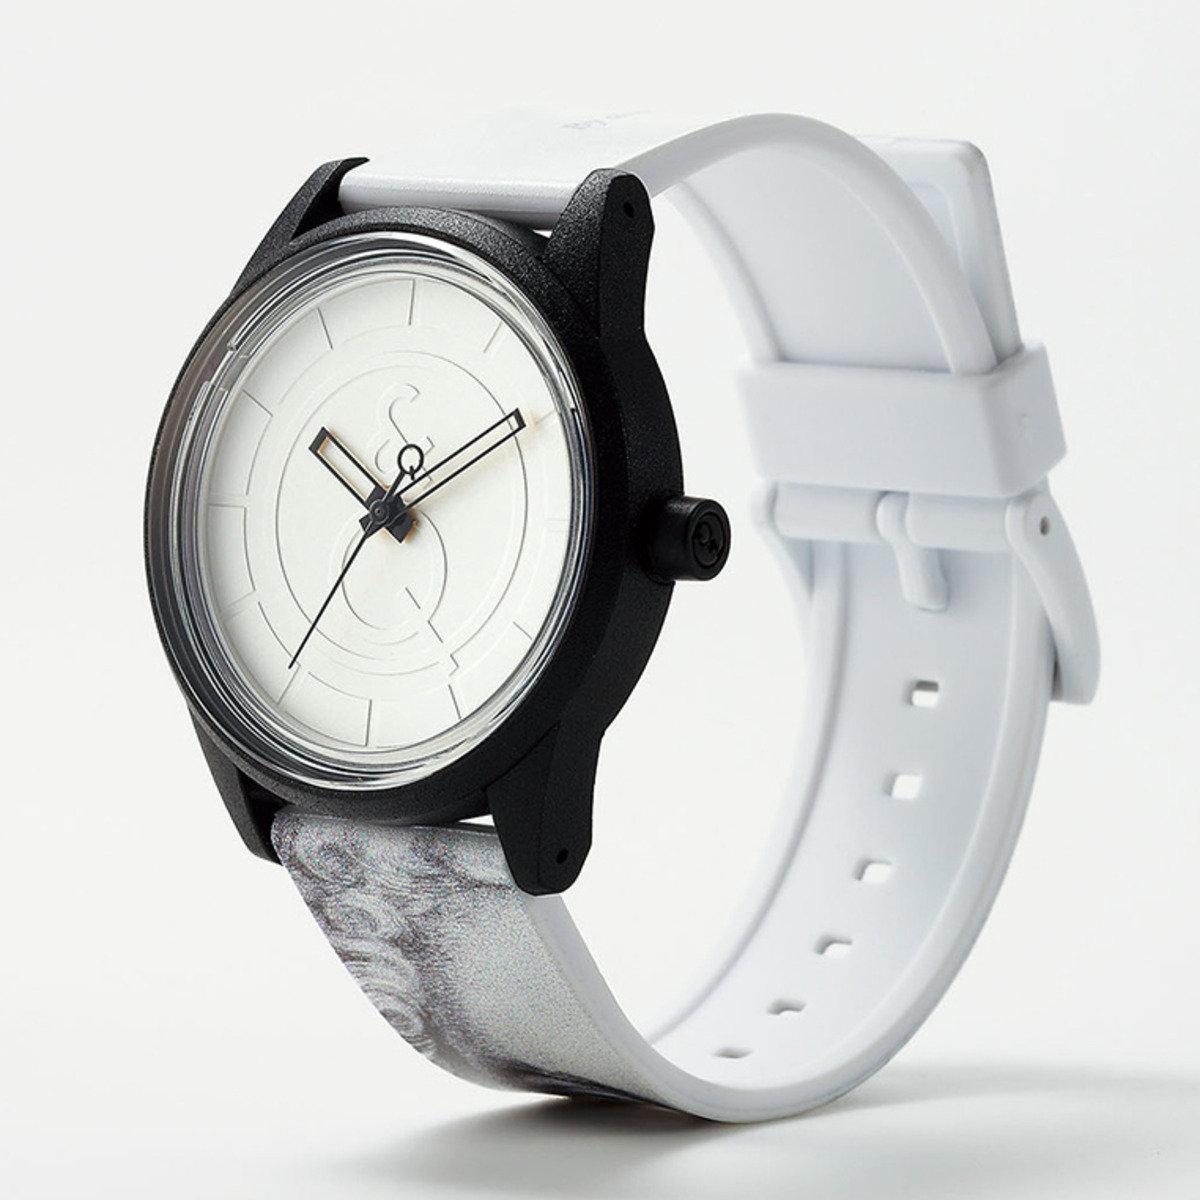 GREAT MAN 手錶 - 牛頓